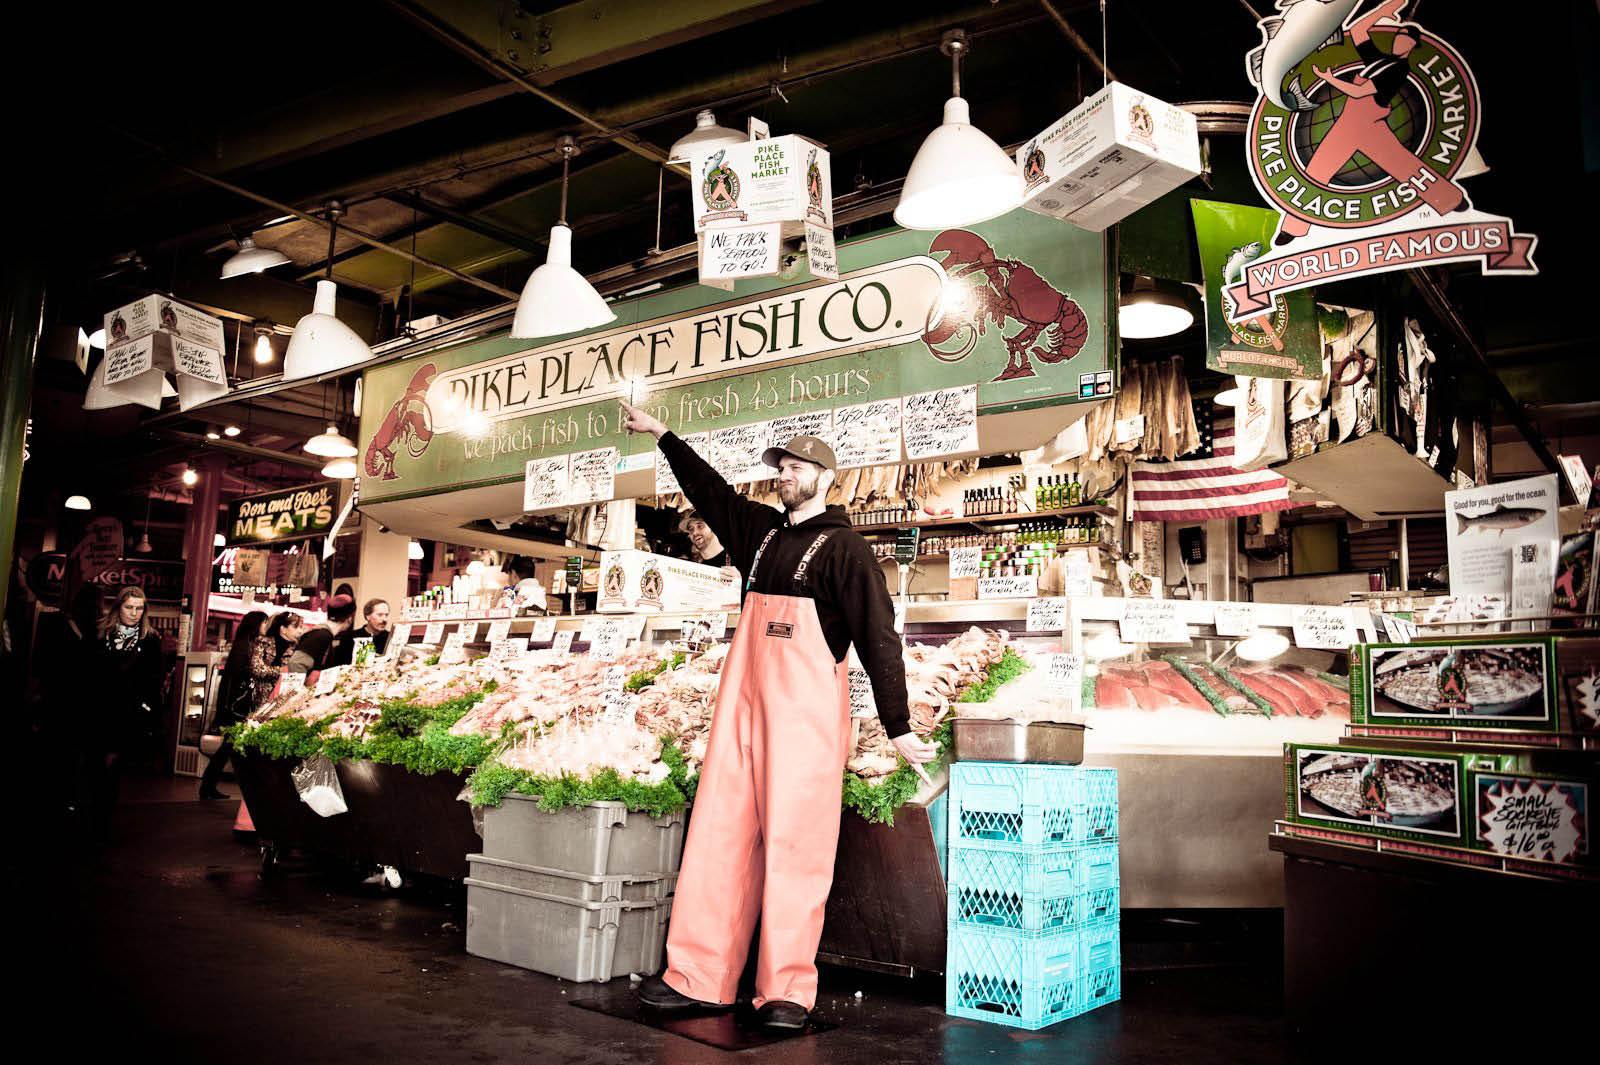 Pike Place Fish Market - Seattle, WA - Pike Place Market - fish - seafood - crab legs - salmon - halibut